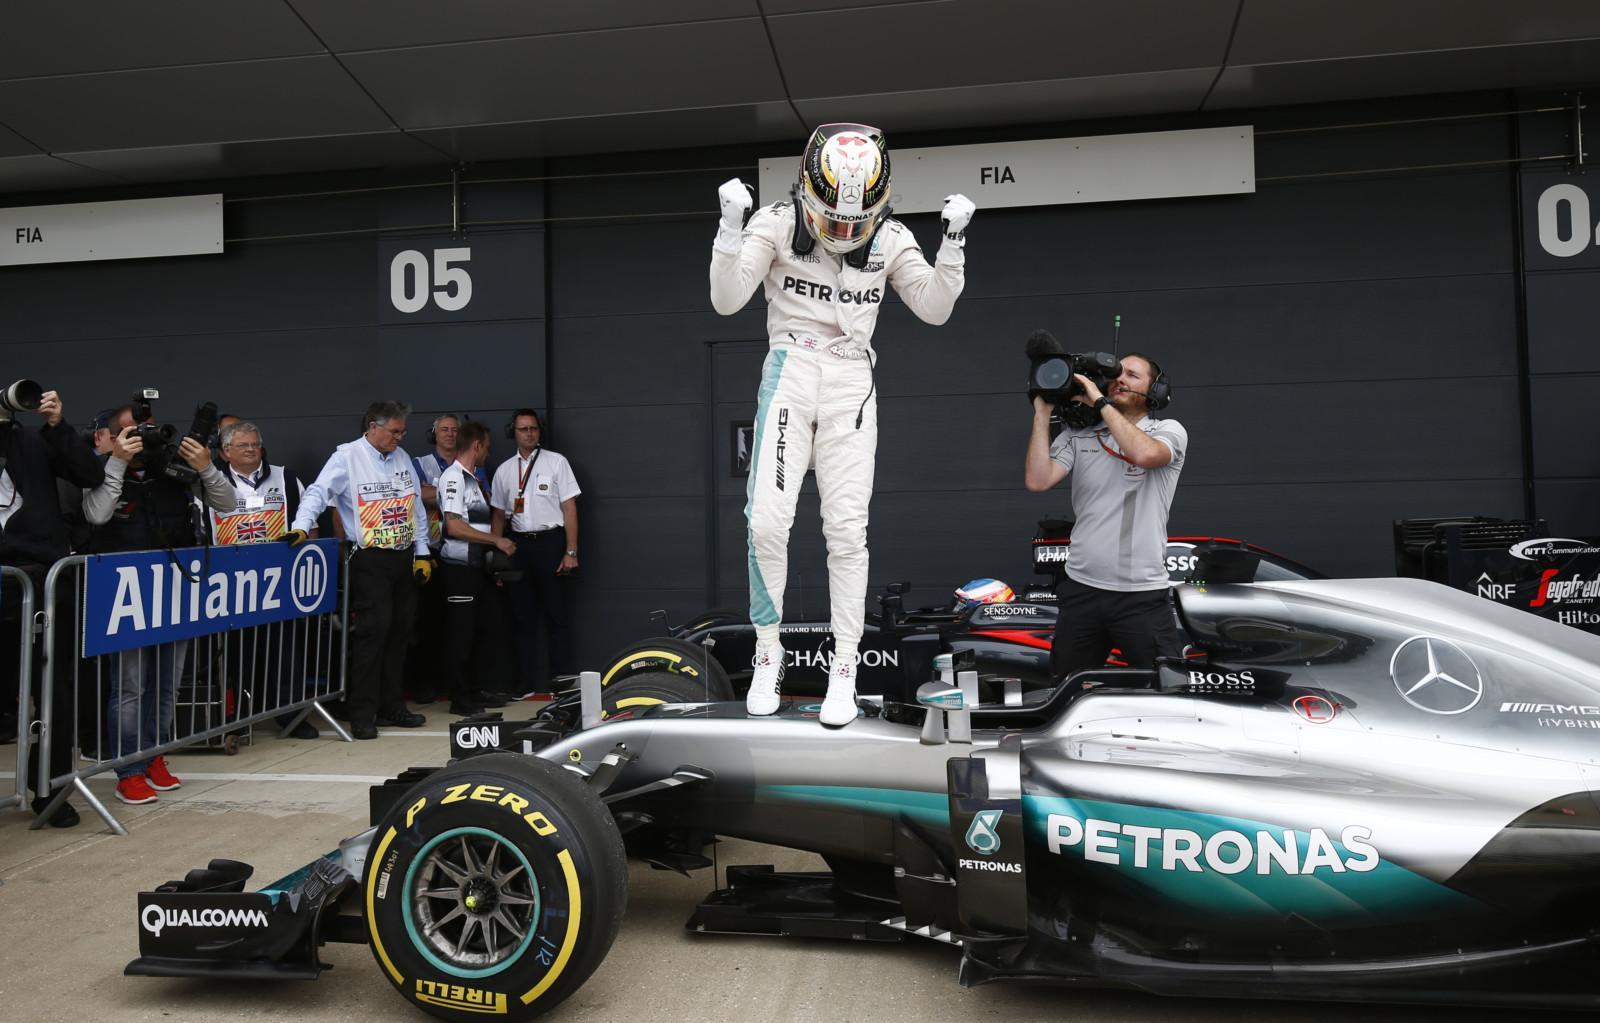 GP de Grande-Bretagne: victoire de Lewis Hamilton (Mercedes)